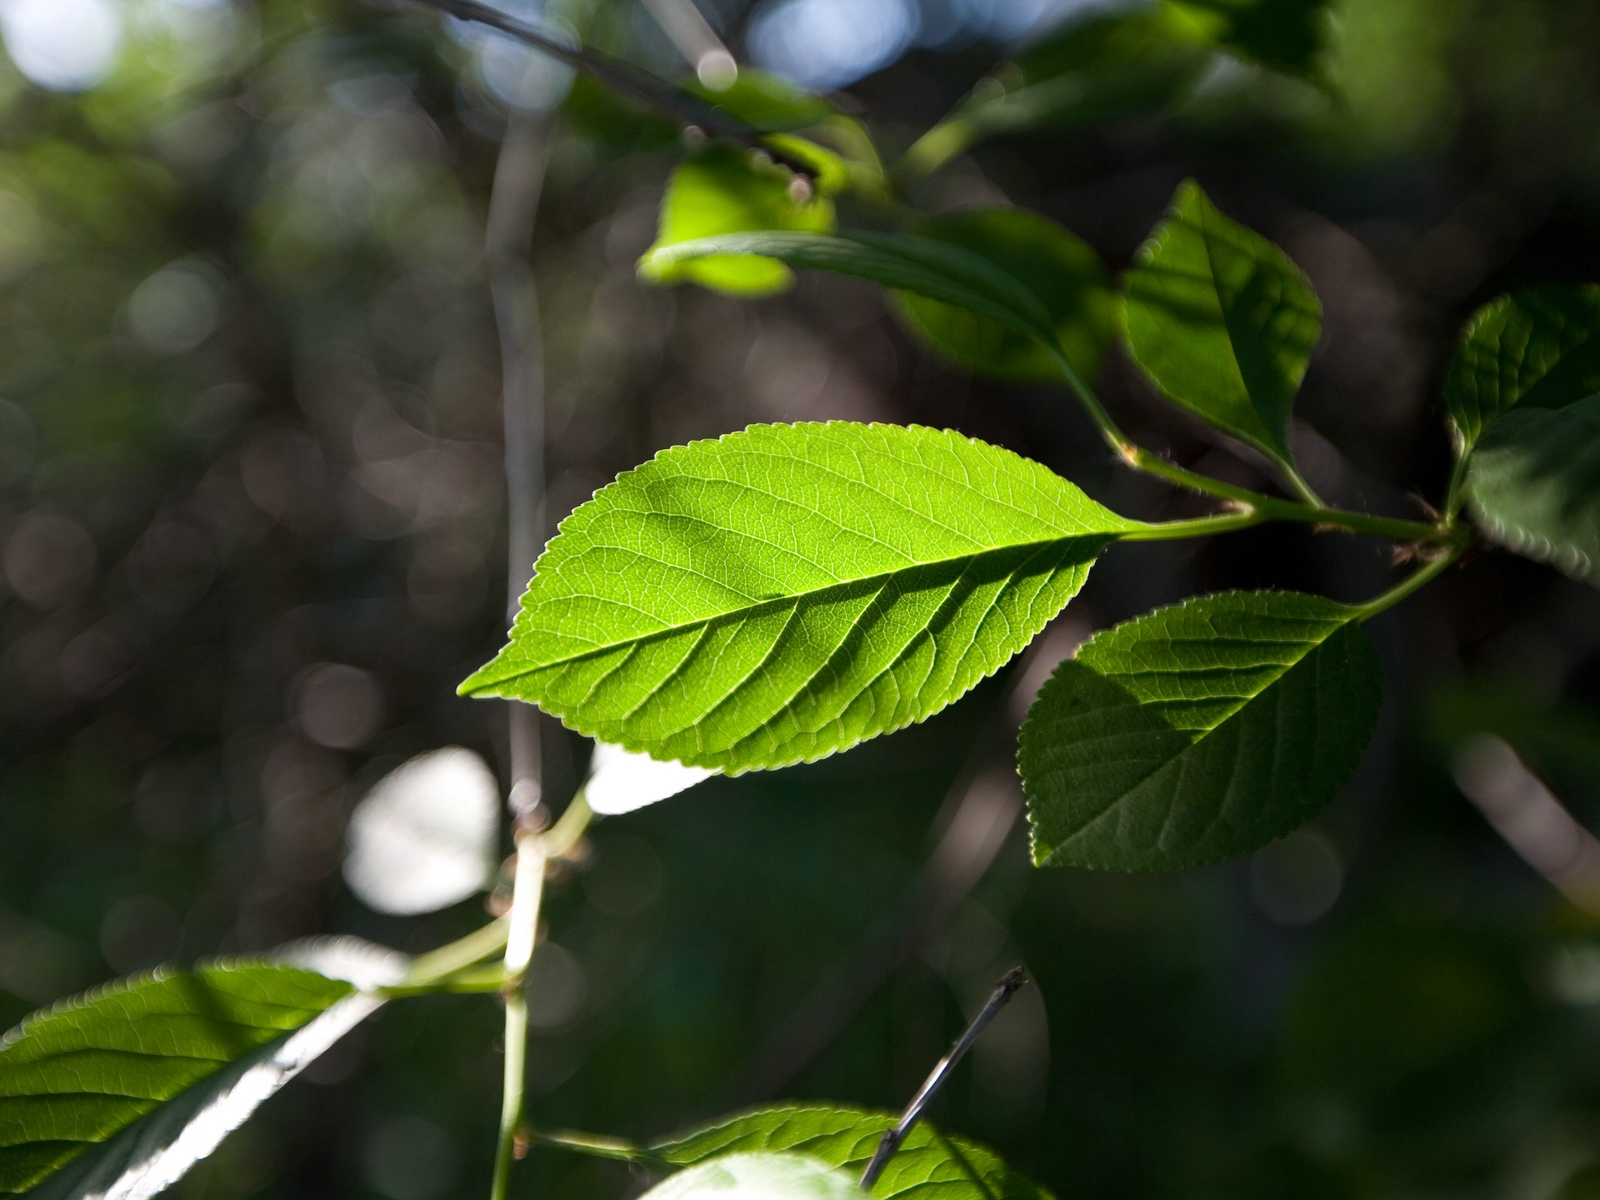 http://2.bp.blogspot.com/-hPt5W9vvDoE/T0AEj--k7ZI/AAAAAAAAGWU/2d29DJbkW-M/s1600/Nature+Wallpaper+0009.jpg